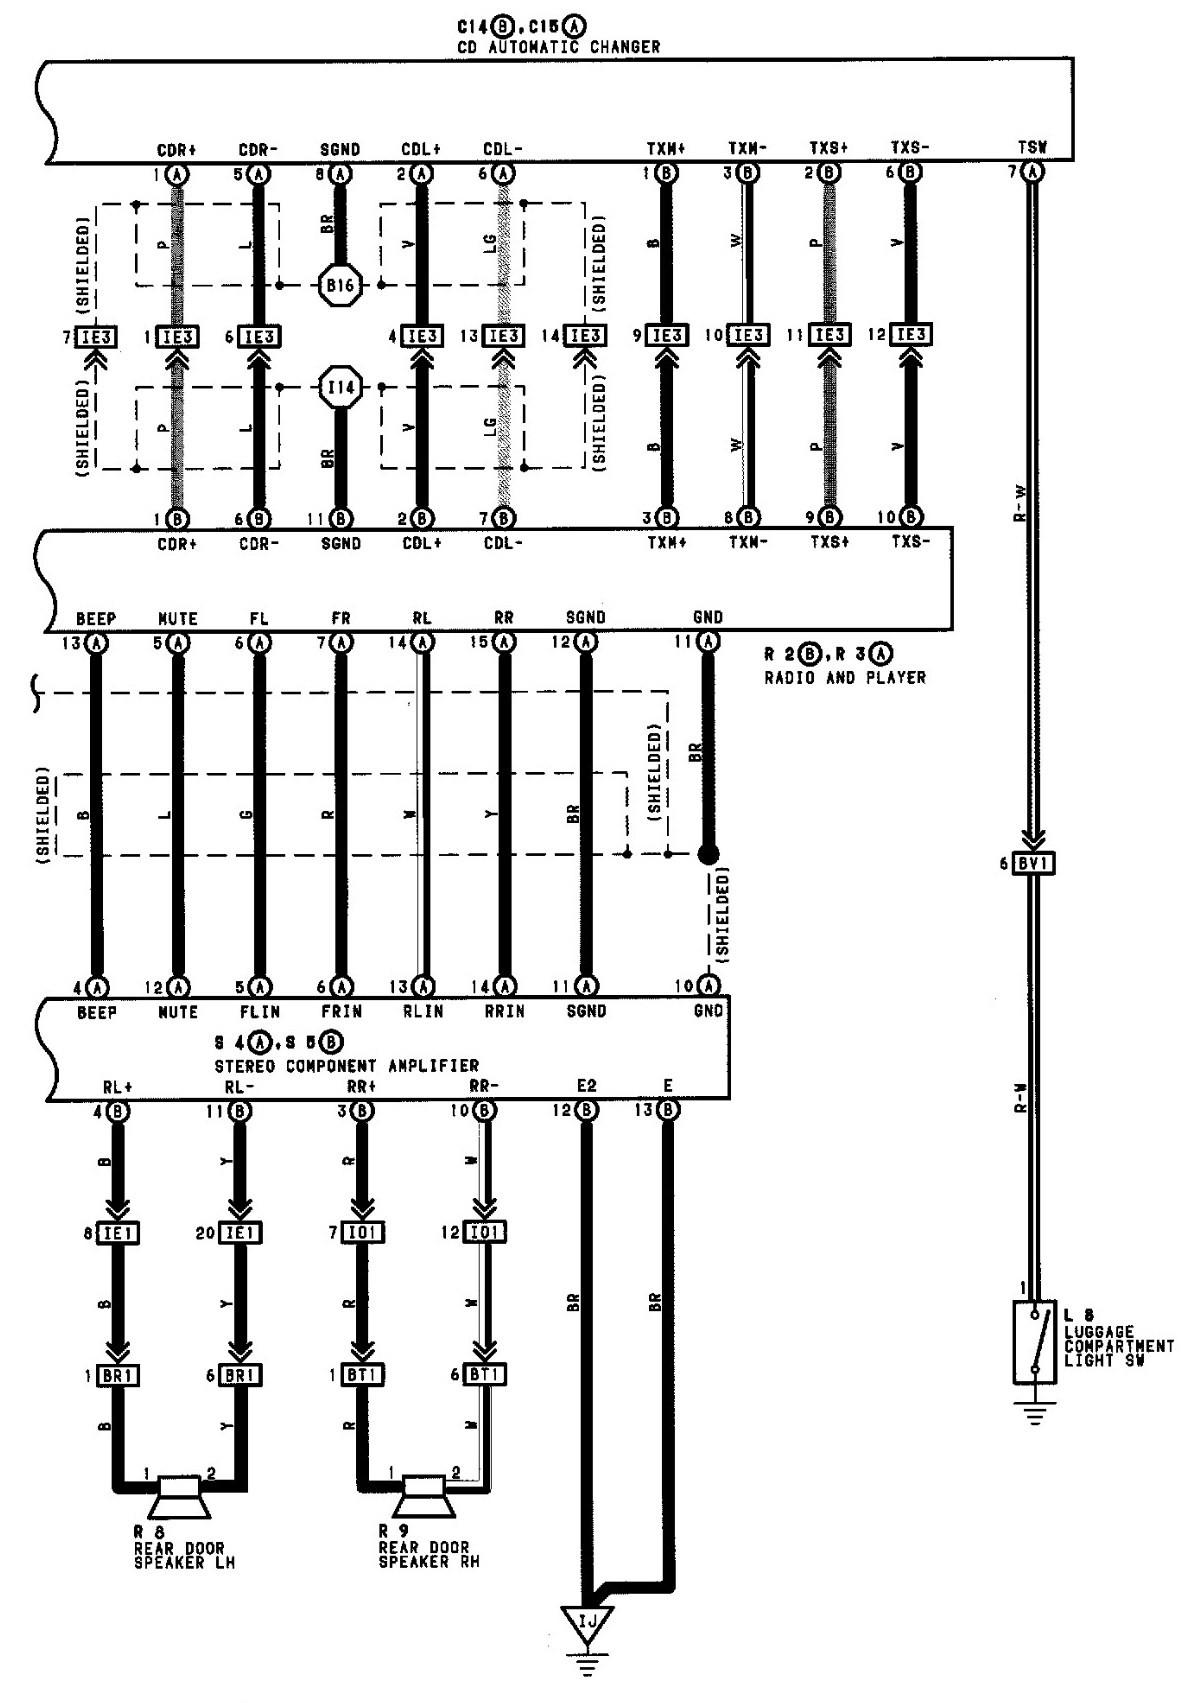 1997 toyota Camry Engine Diagram Stunning 1995 toyota Camry Wiring Diagram Everything You Of 1997 toyota Camry Engine Diagram